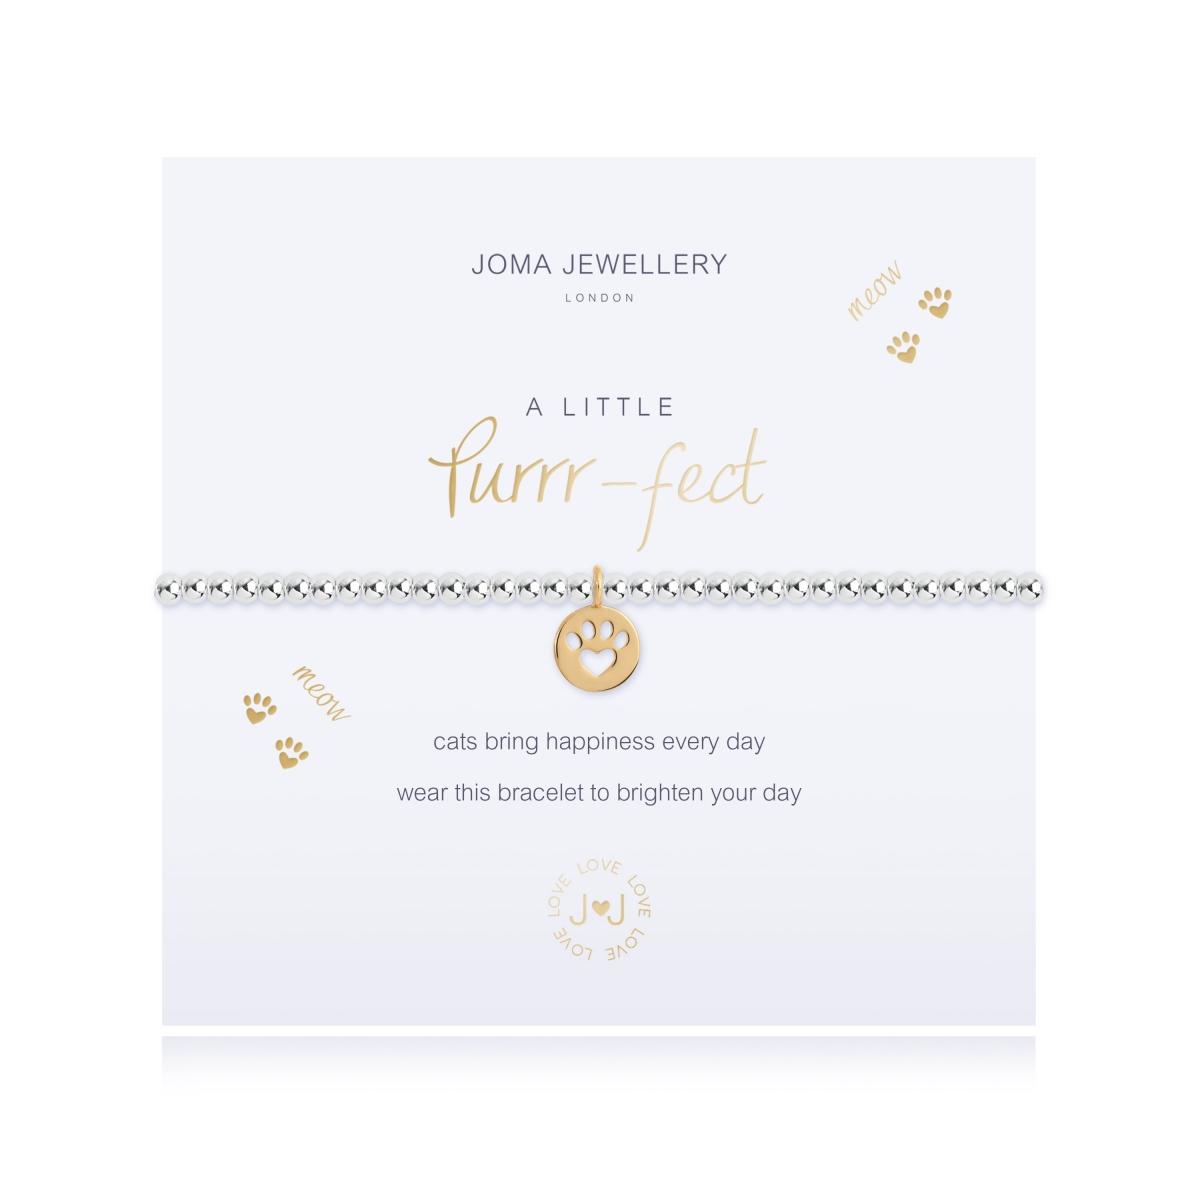 Joma Jewellery A Little 'Purrr-fect'